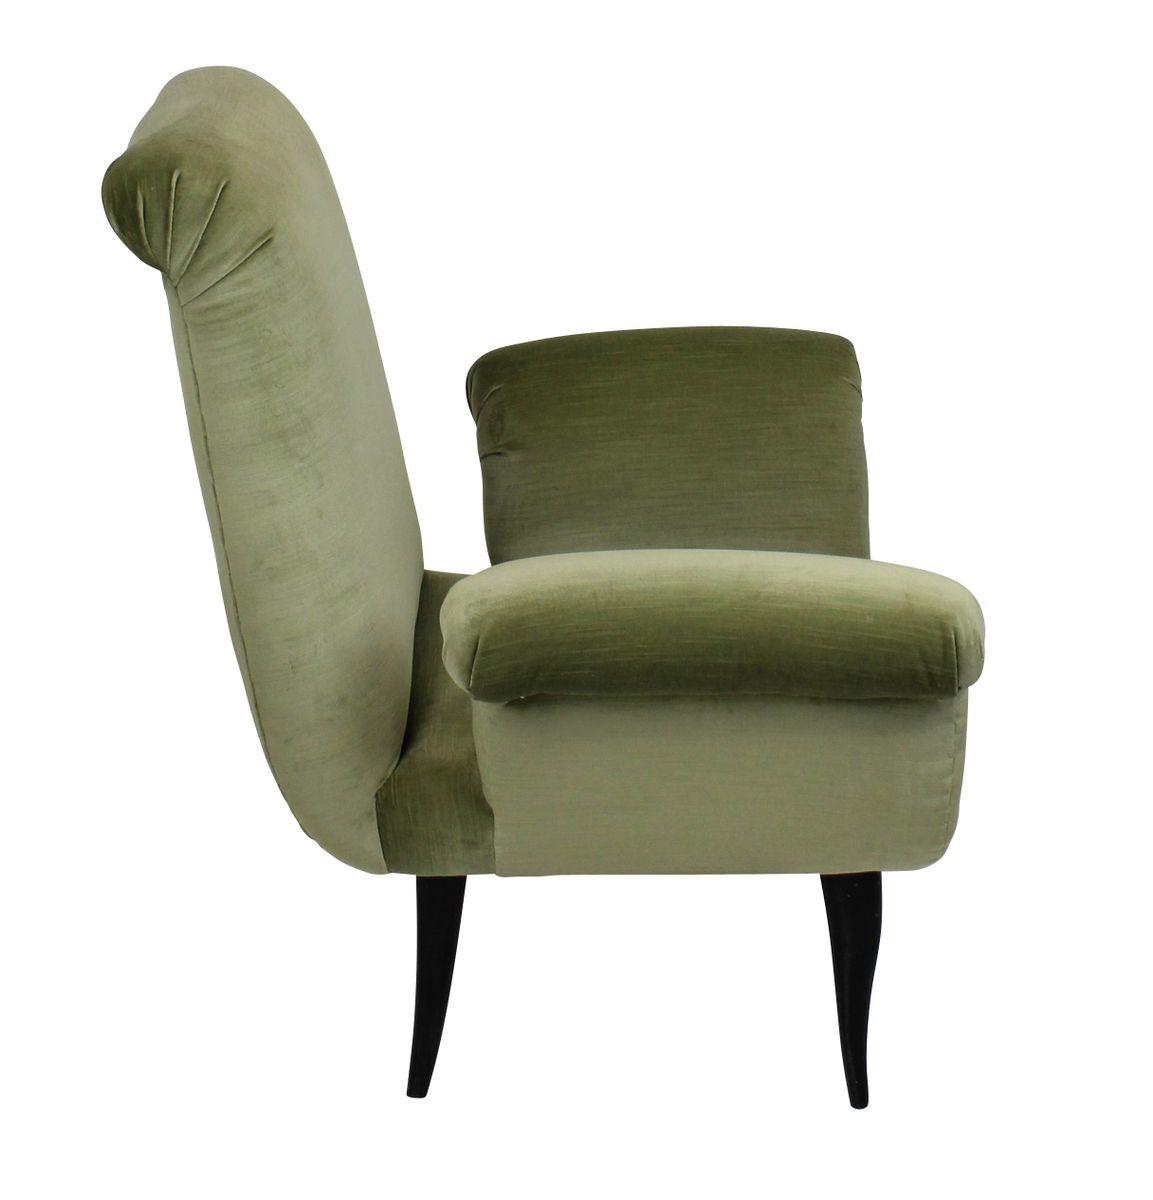 fauteuils vintage en velours vert italie set de 2 en. Black Bedroom Furniture Sets. Home Design Ideas